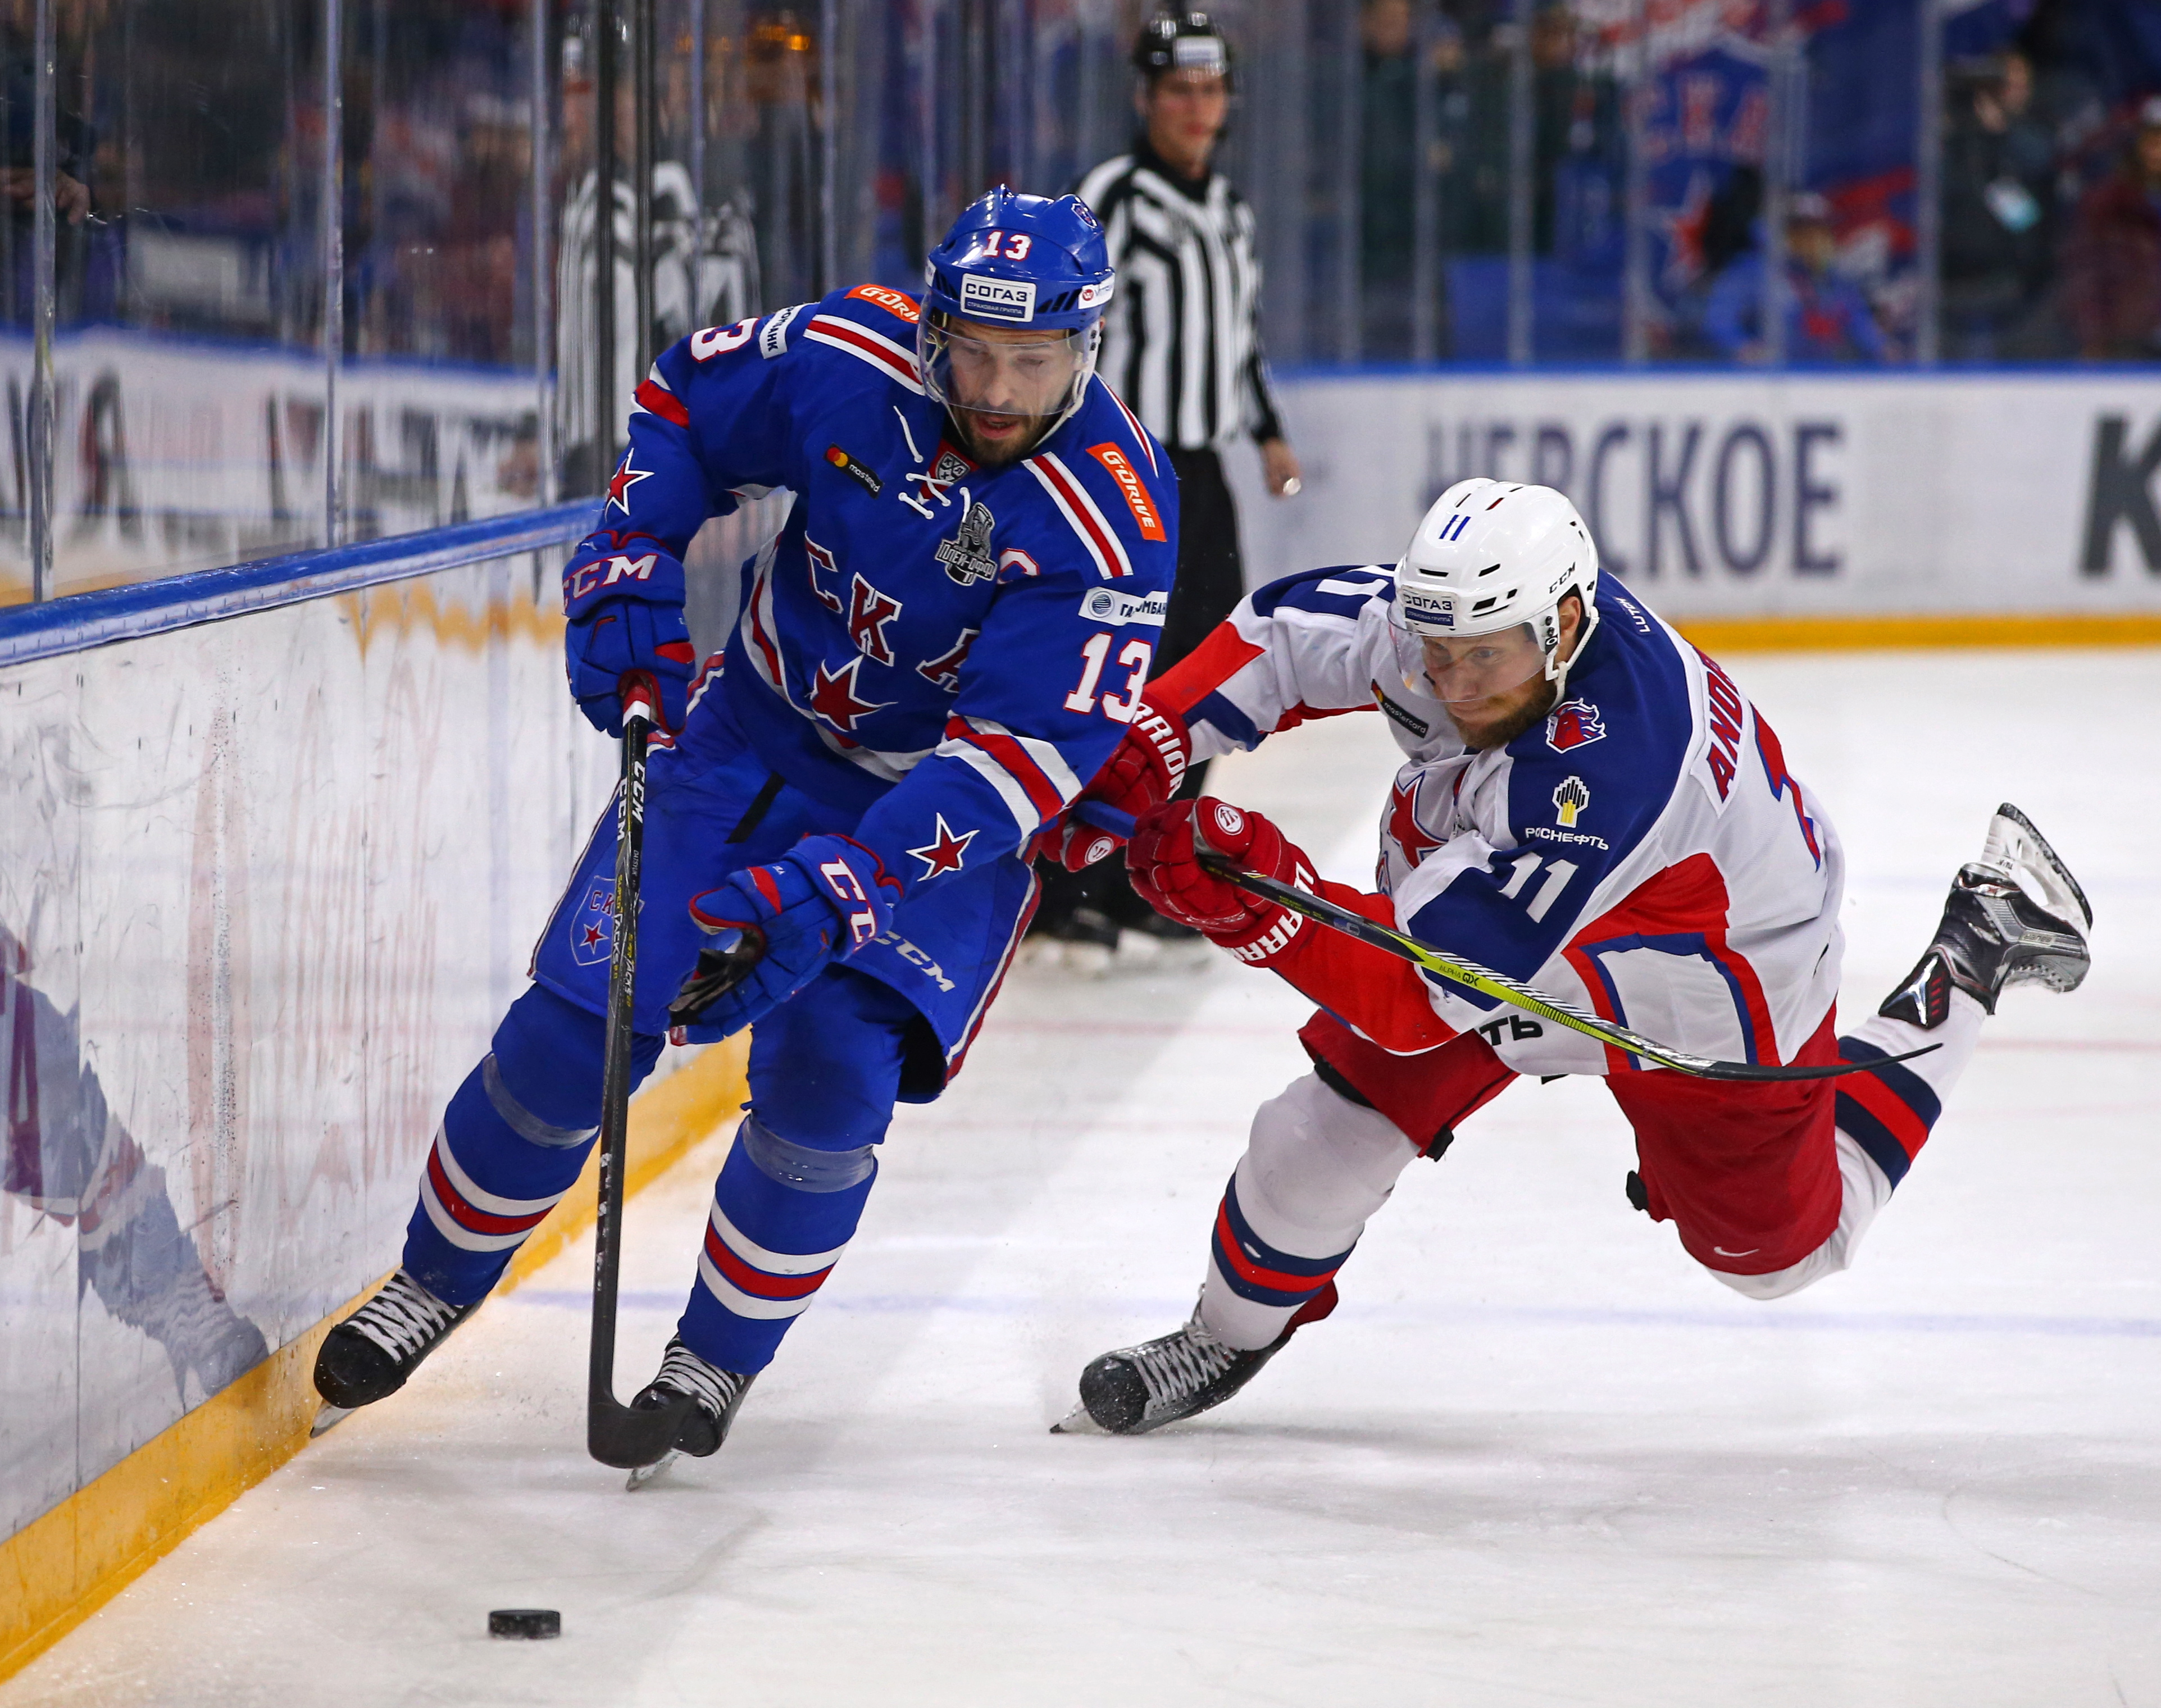 Kontinental Hockey League Western Conference Final: SKA St Petersburg vs CSKA Moscow